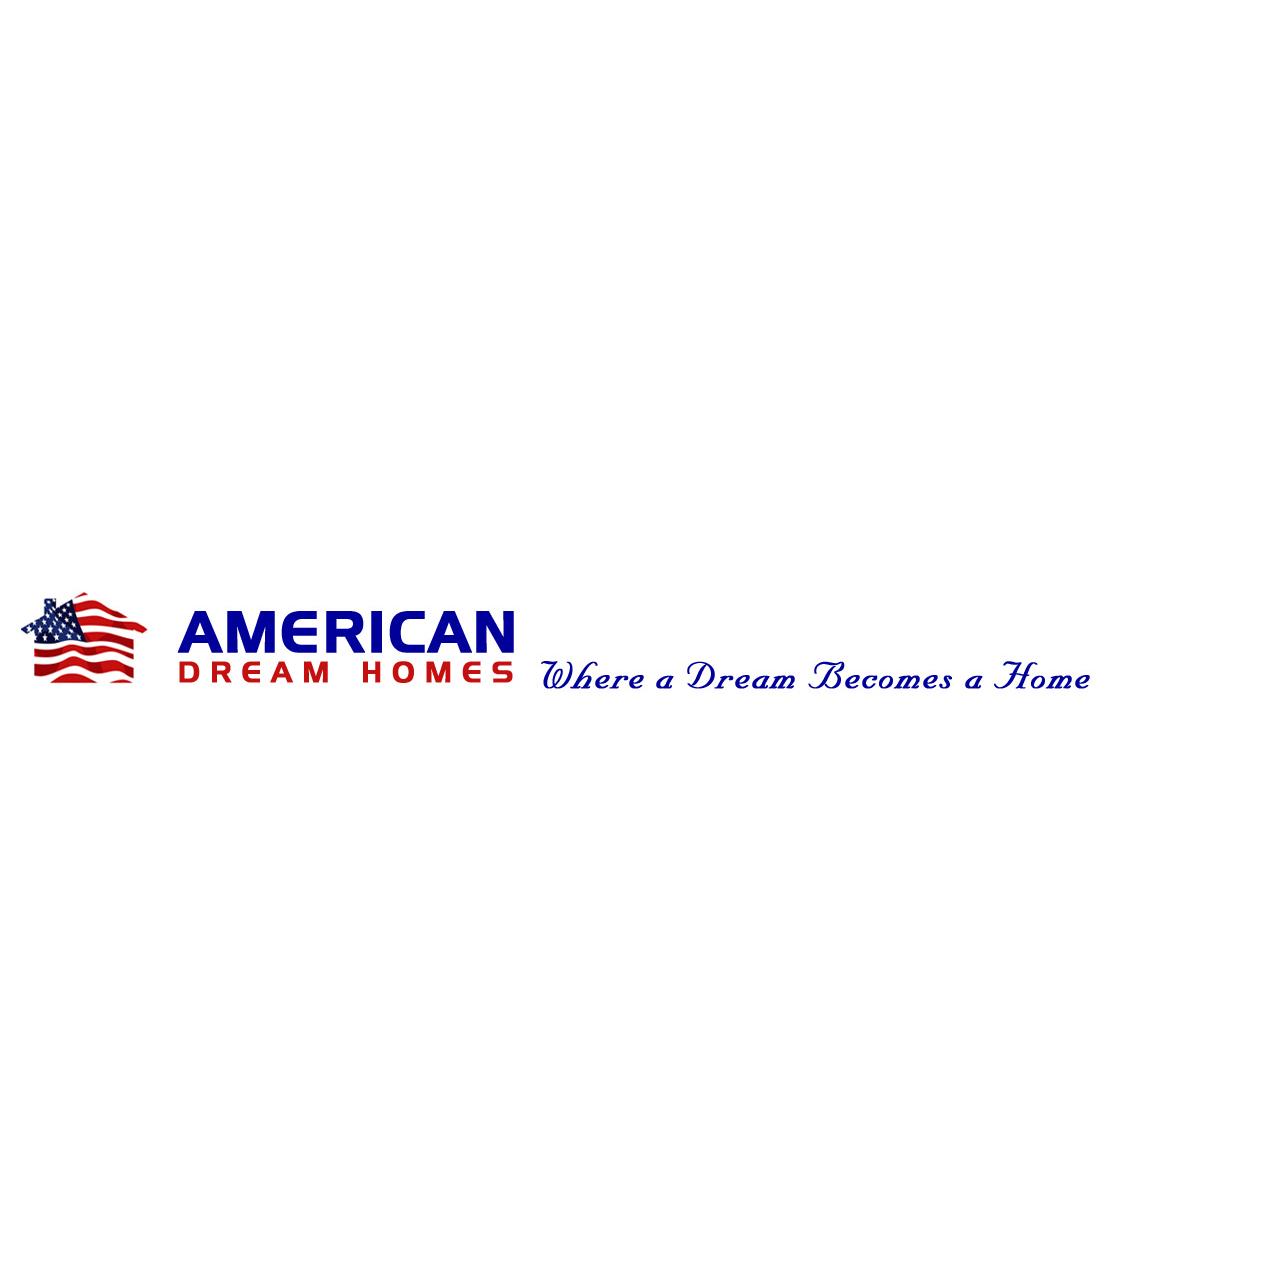 American dream homes in santa rosa ca 707 575 7 for American dream home builders